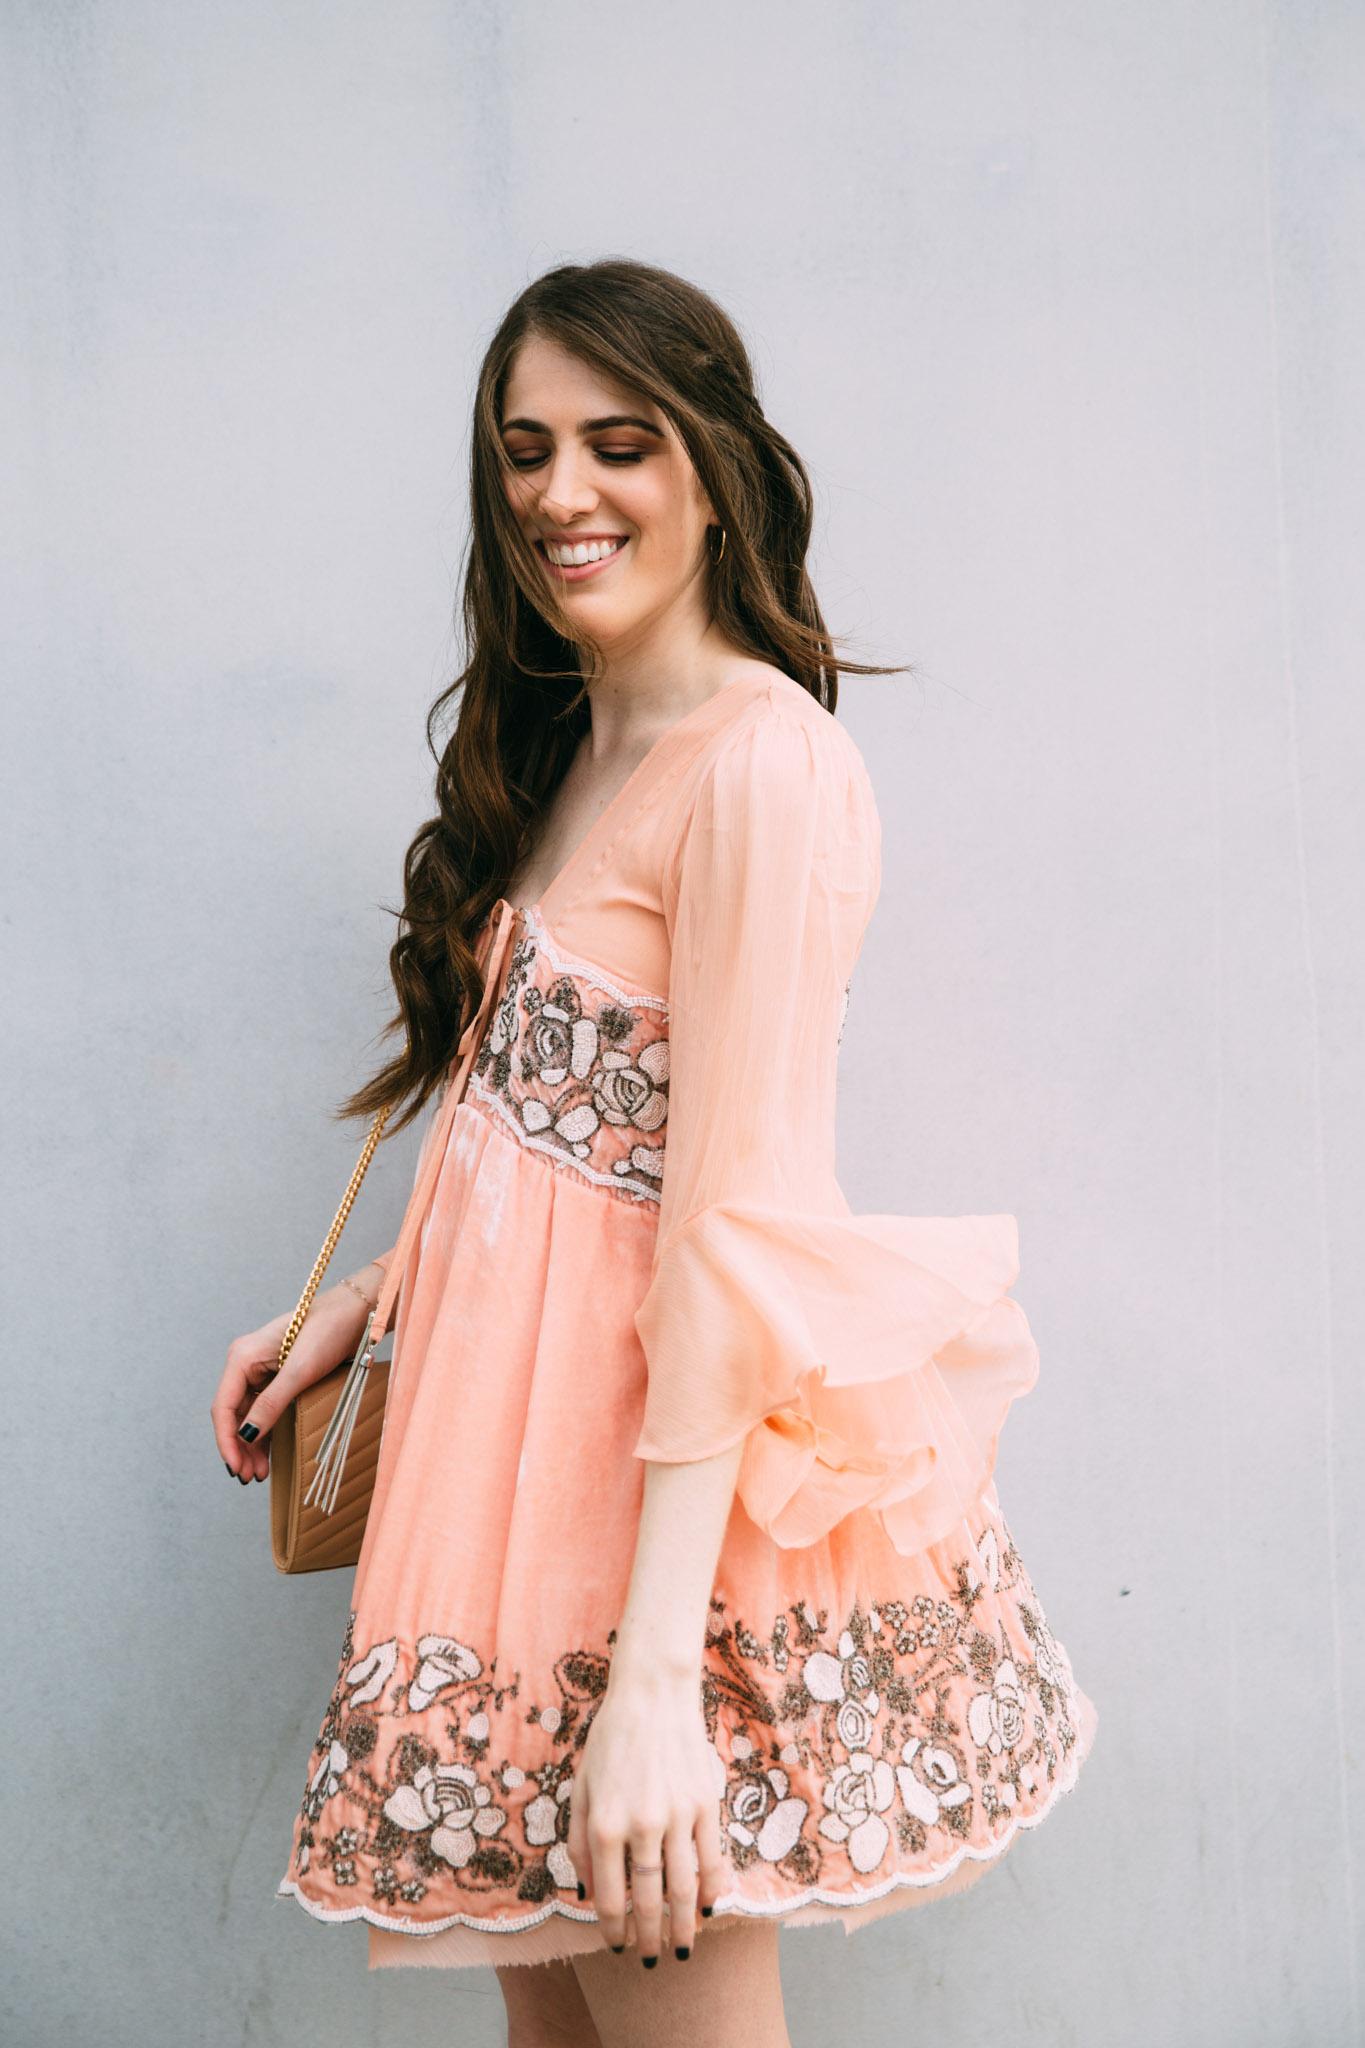 Free People embellished blush dress